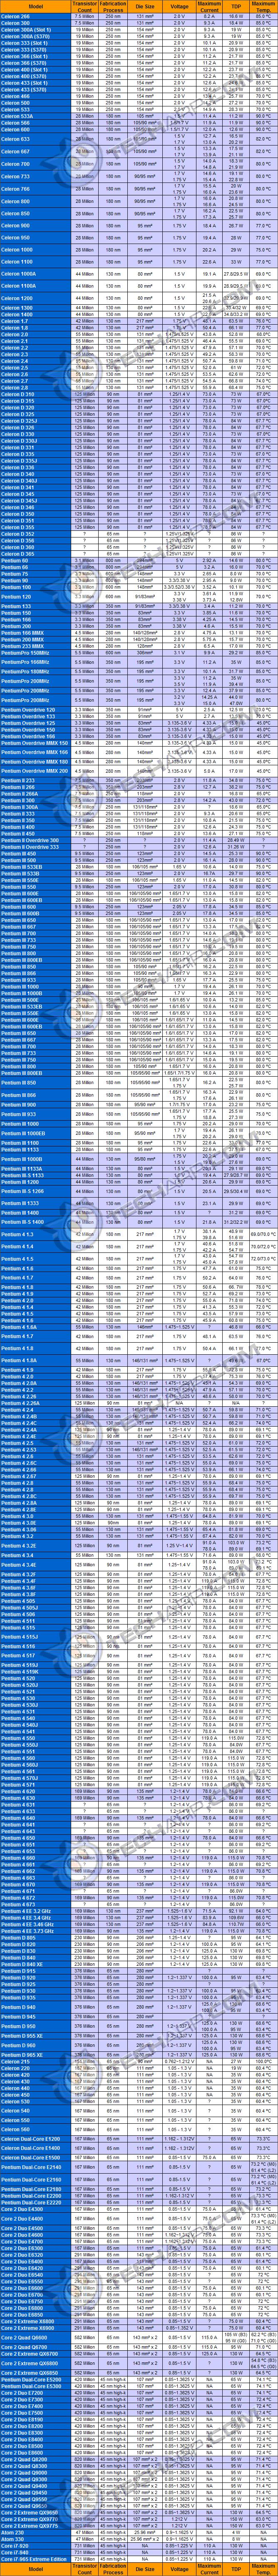 CPU Power (Intel)